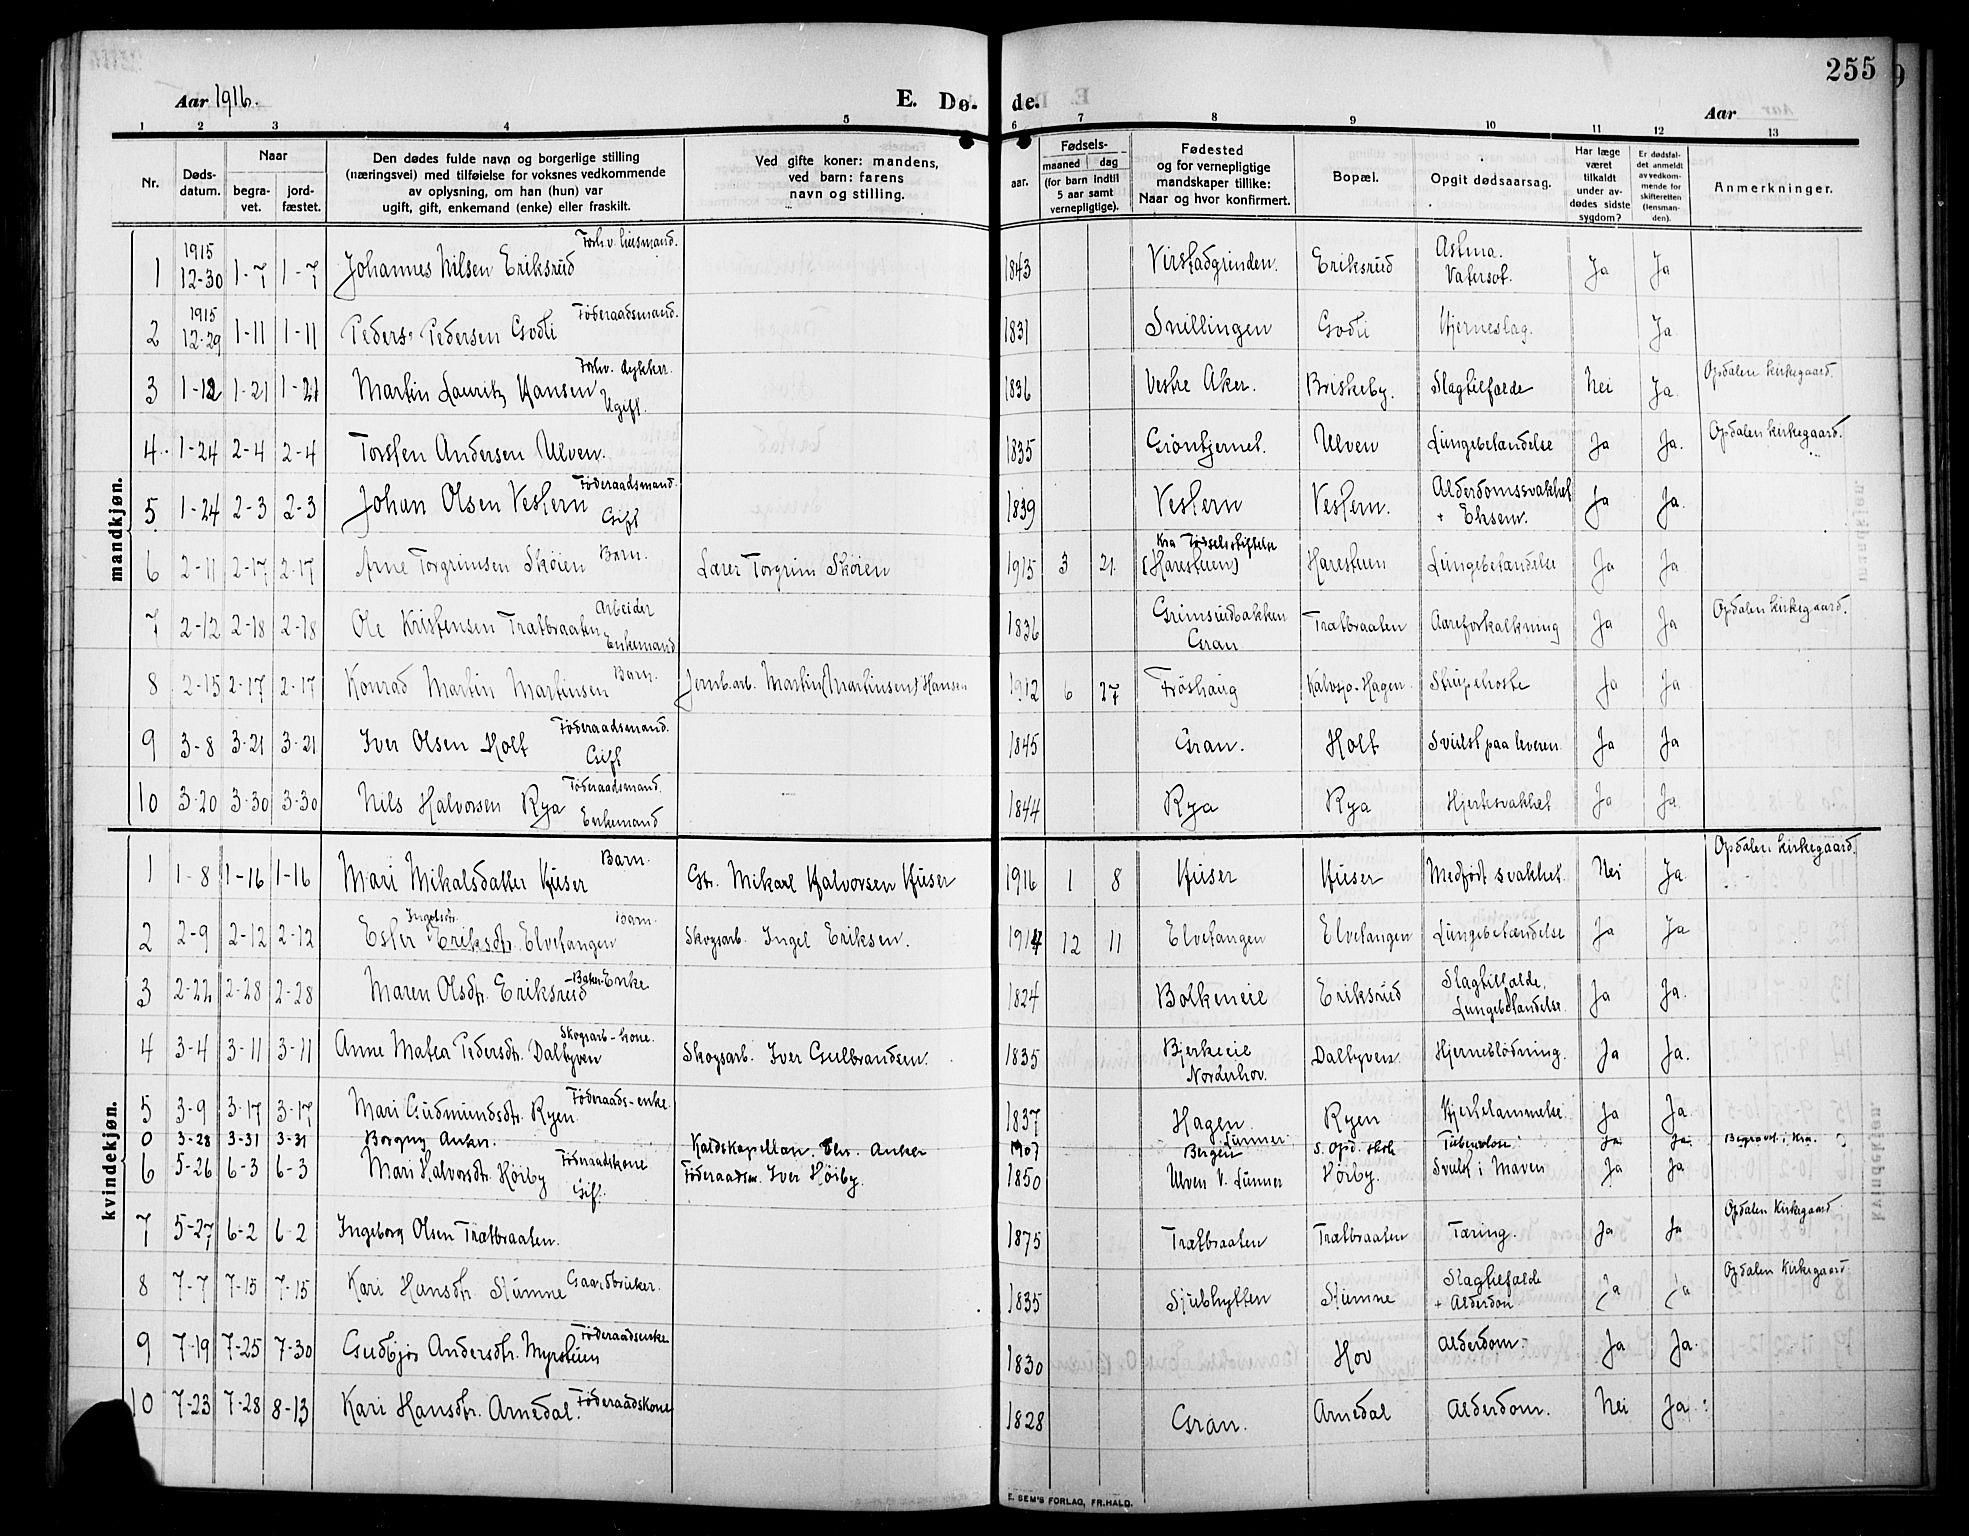 SAH, Lunner prestekontor, H/Ha/Hab/L0001: Klokkerbok nr. 1, 1909-1922, s. 255